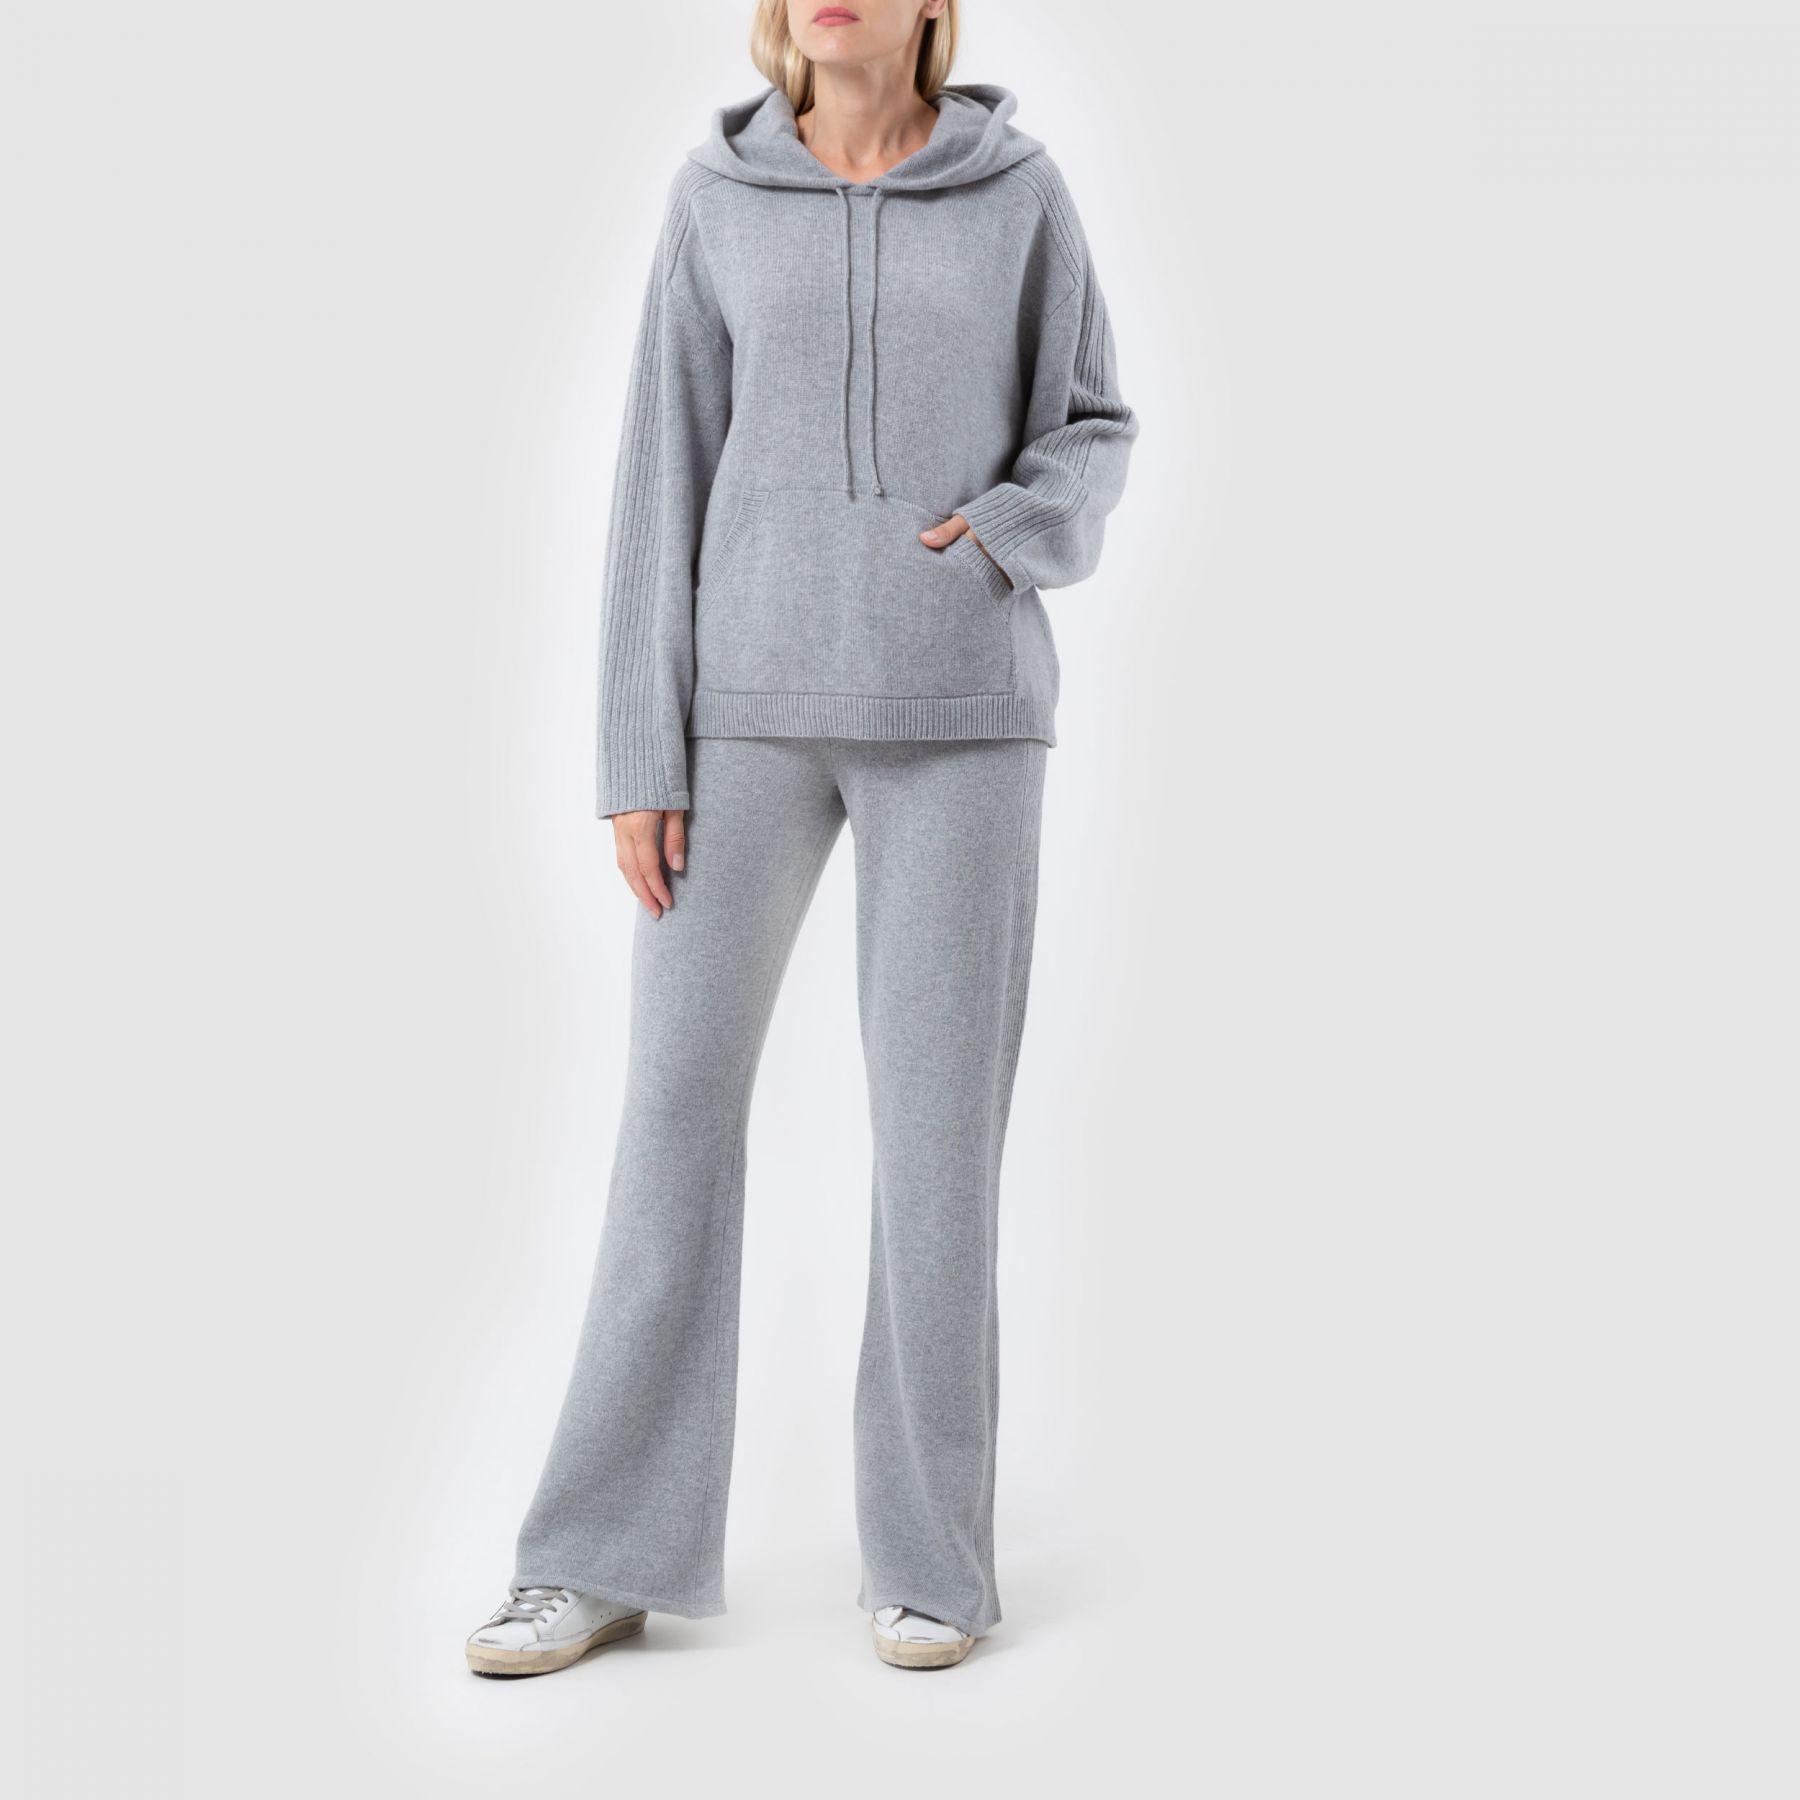 Спортивные брюки Alberta Ferretti светло-серые